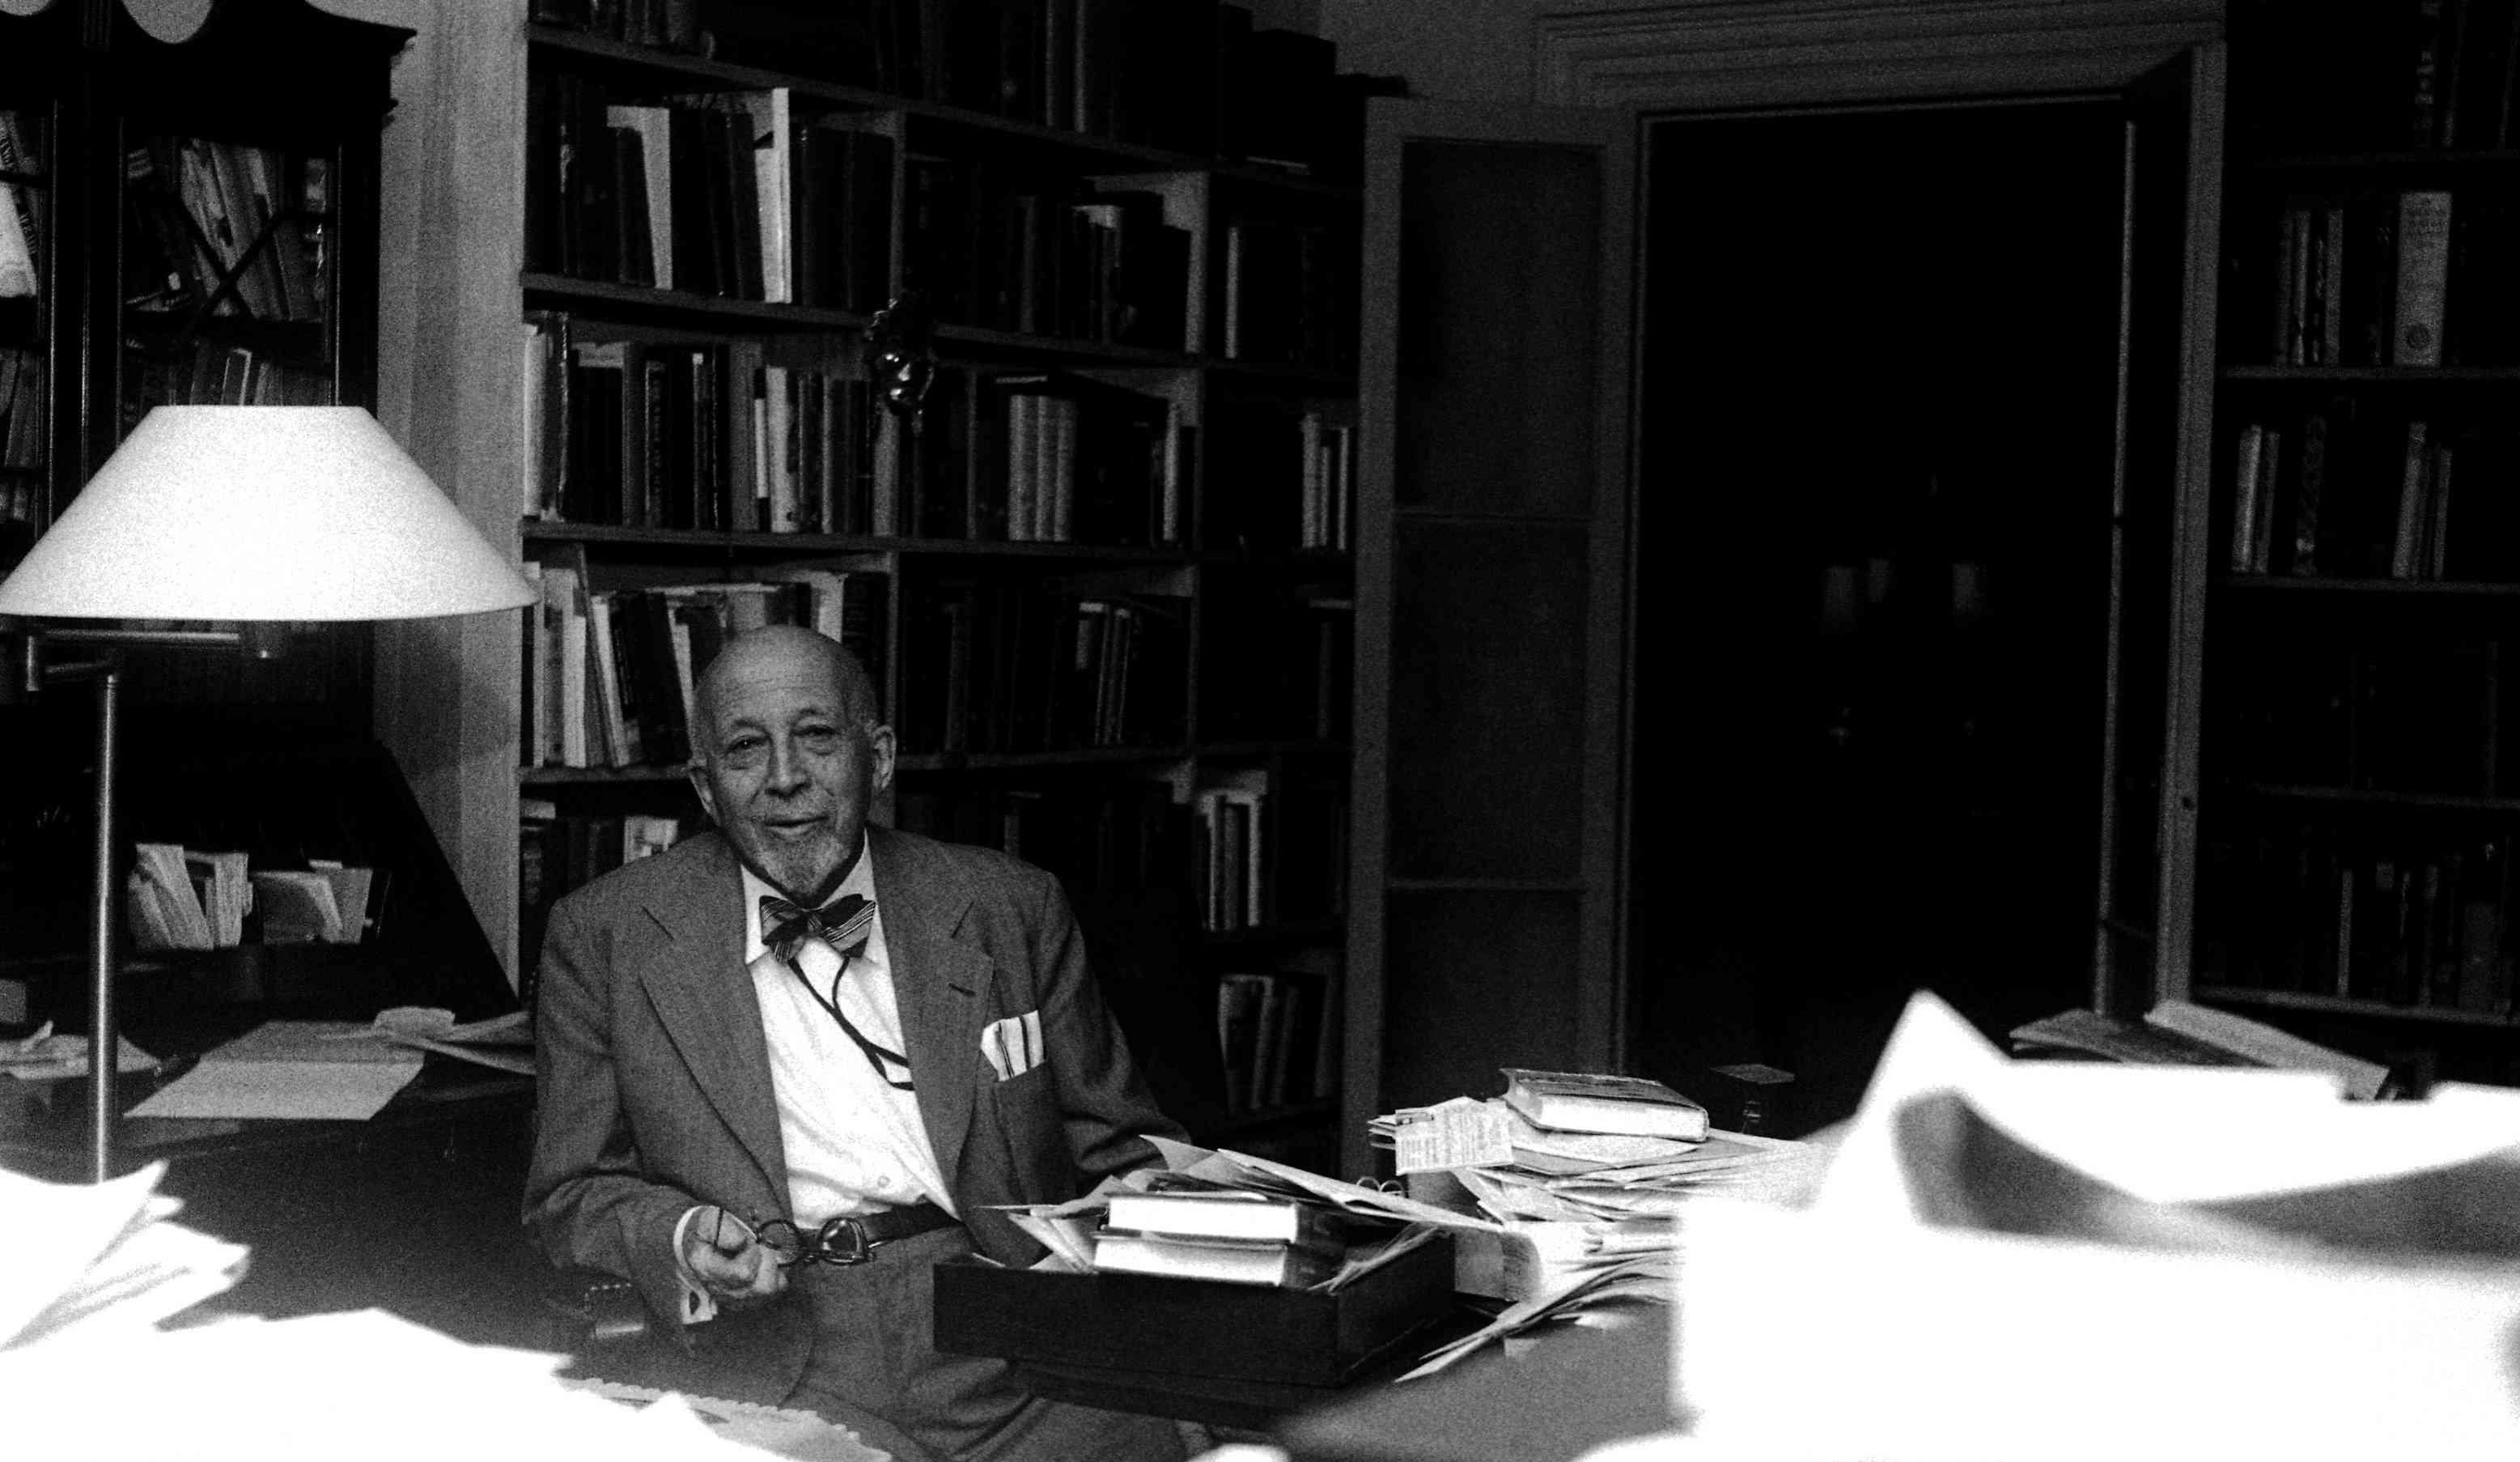 W. E. B. Du Bois sitting at a desk